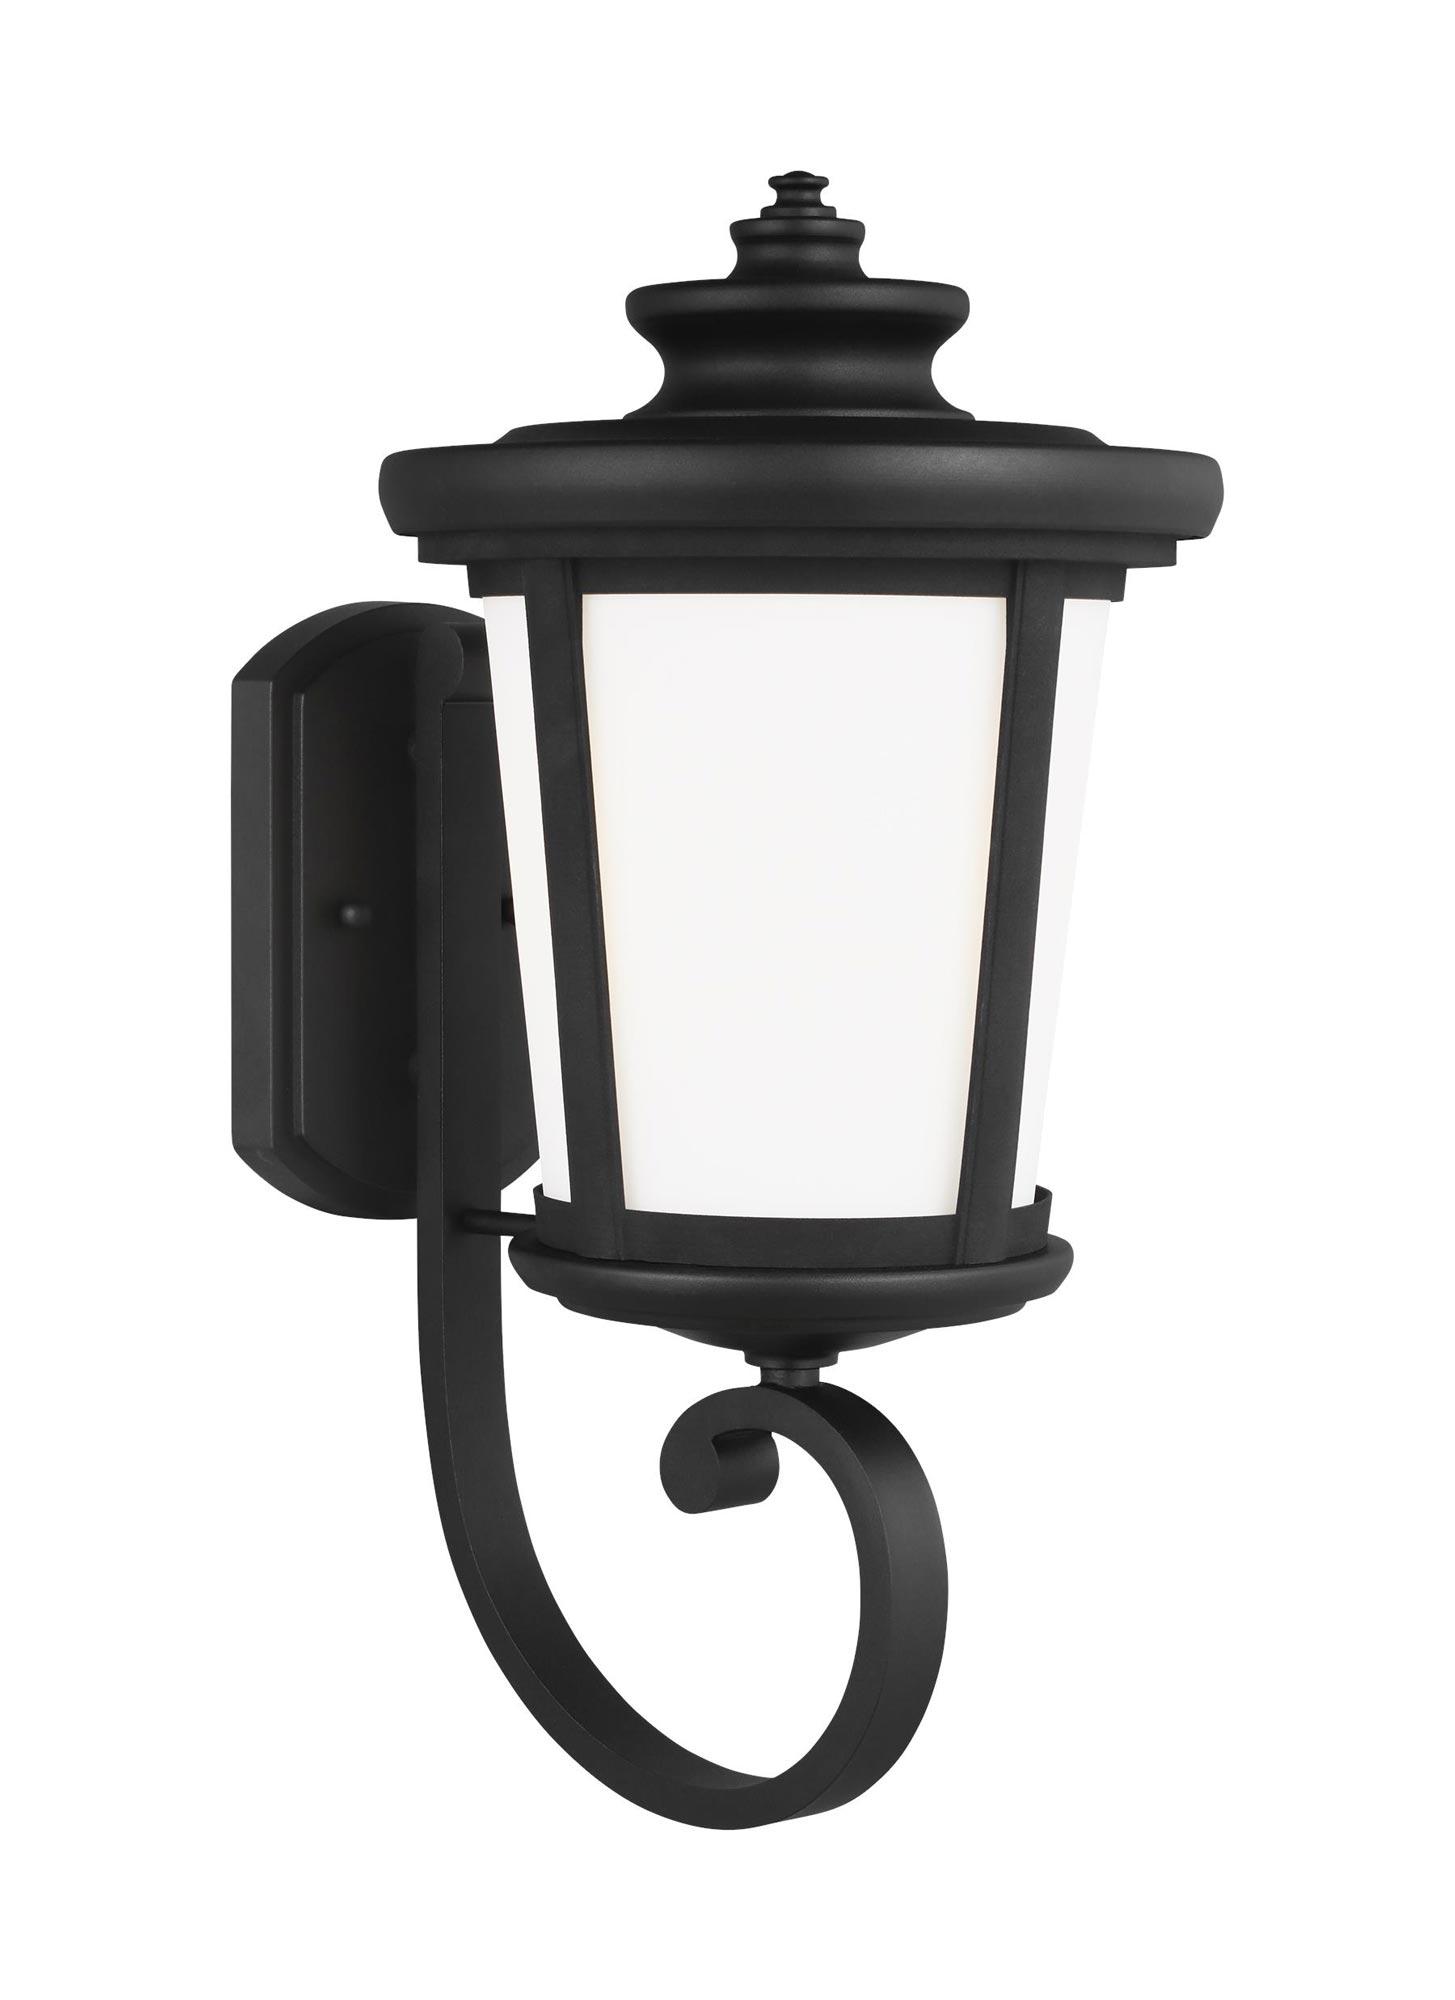 Eddington Uplight Outdoor Wall Sconce By Sea Gull Lighting 8819401 12